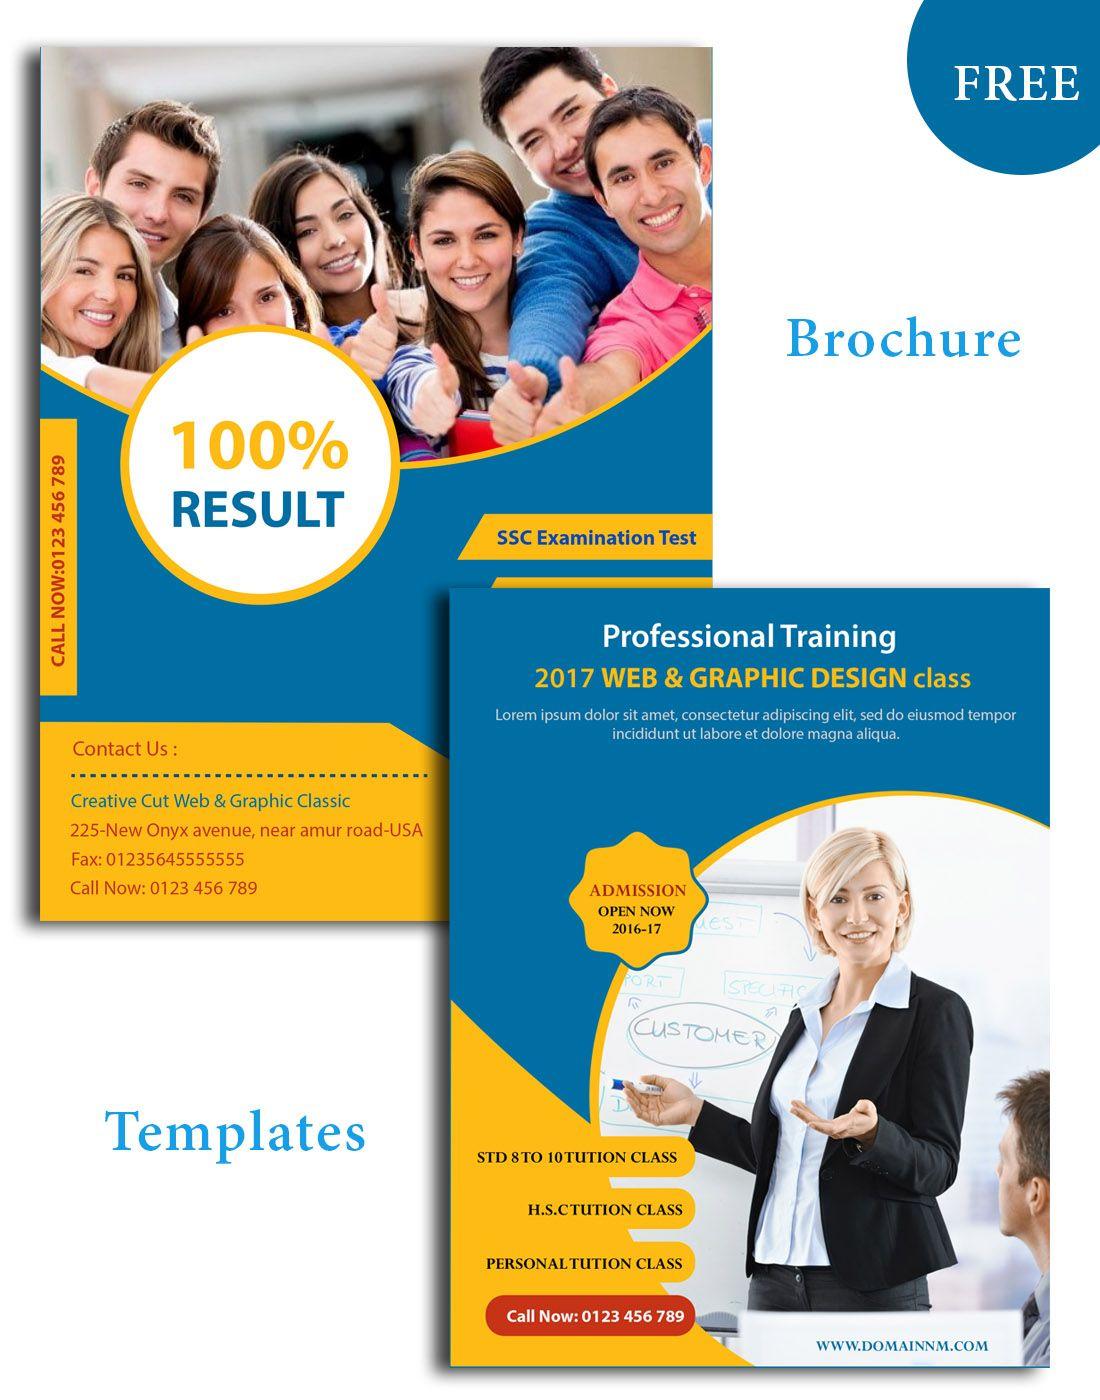 Education Psd Brochure Templates Brochure Design Pinterest - Education brochure templates